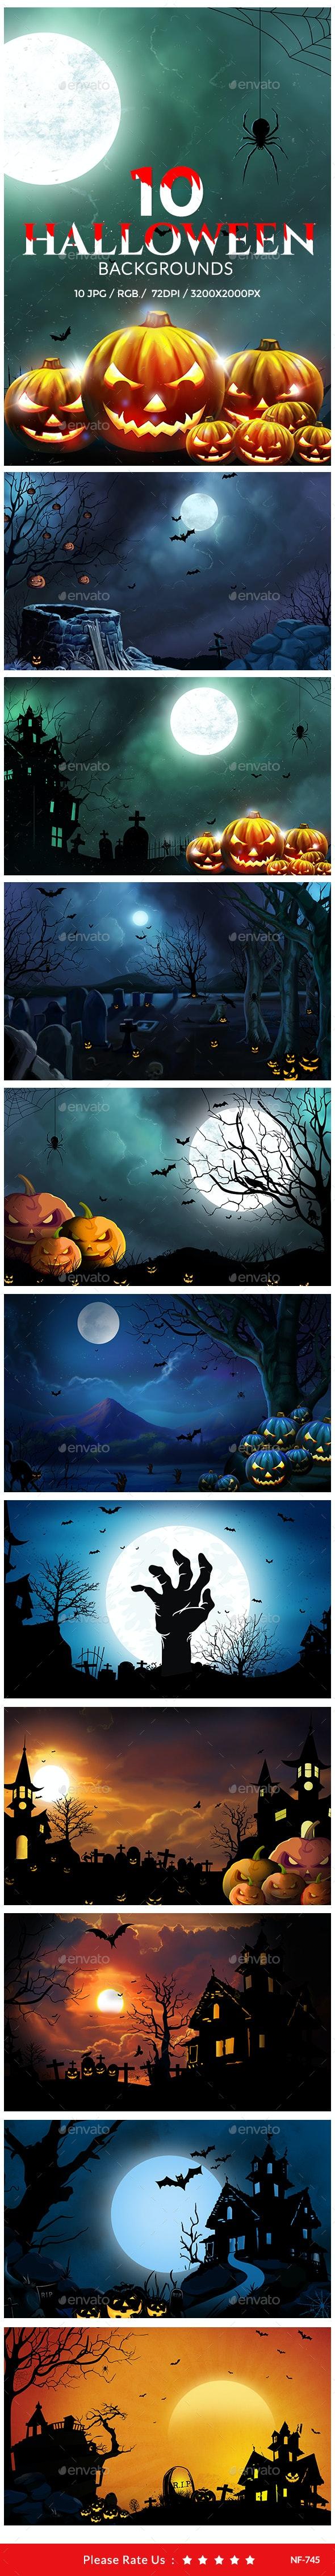 10 Halloween Backgrounds - Backgrounds Graphics